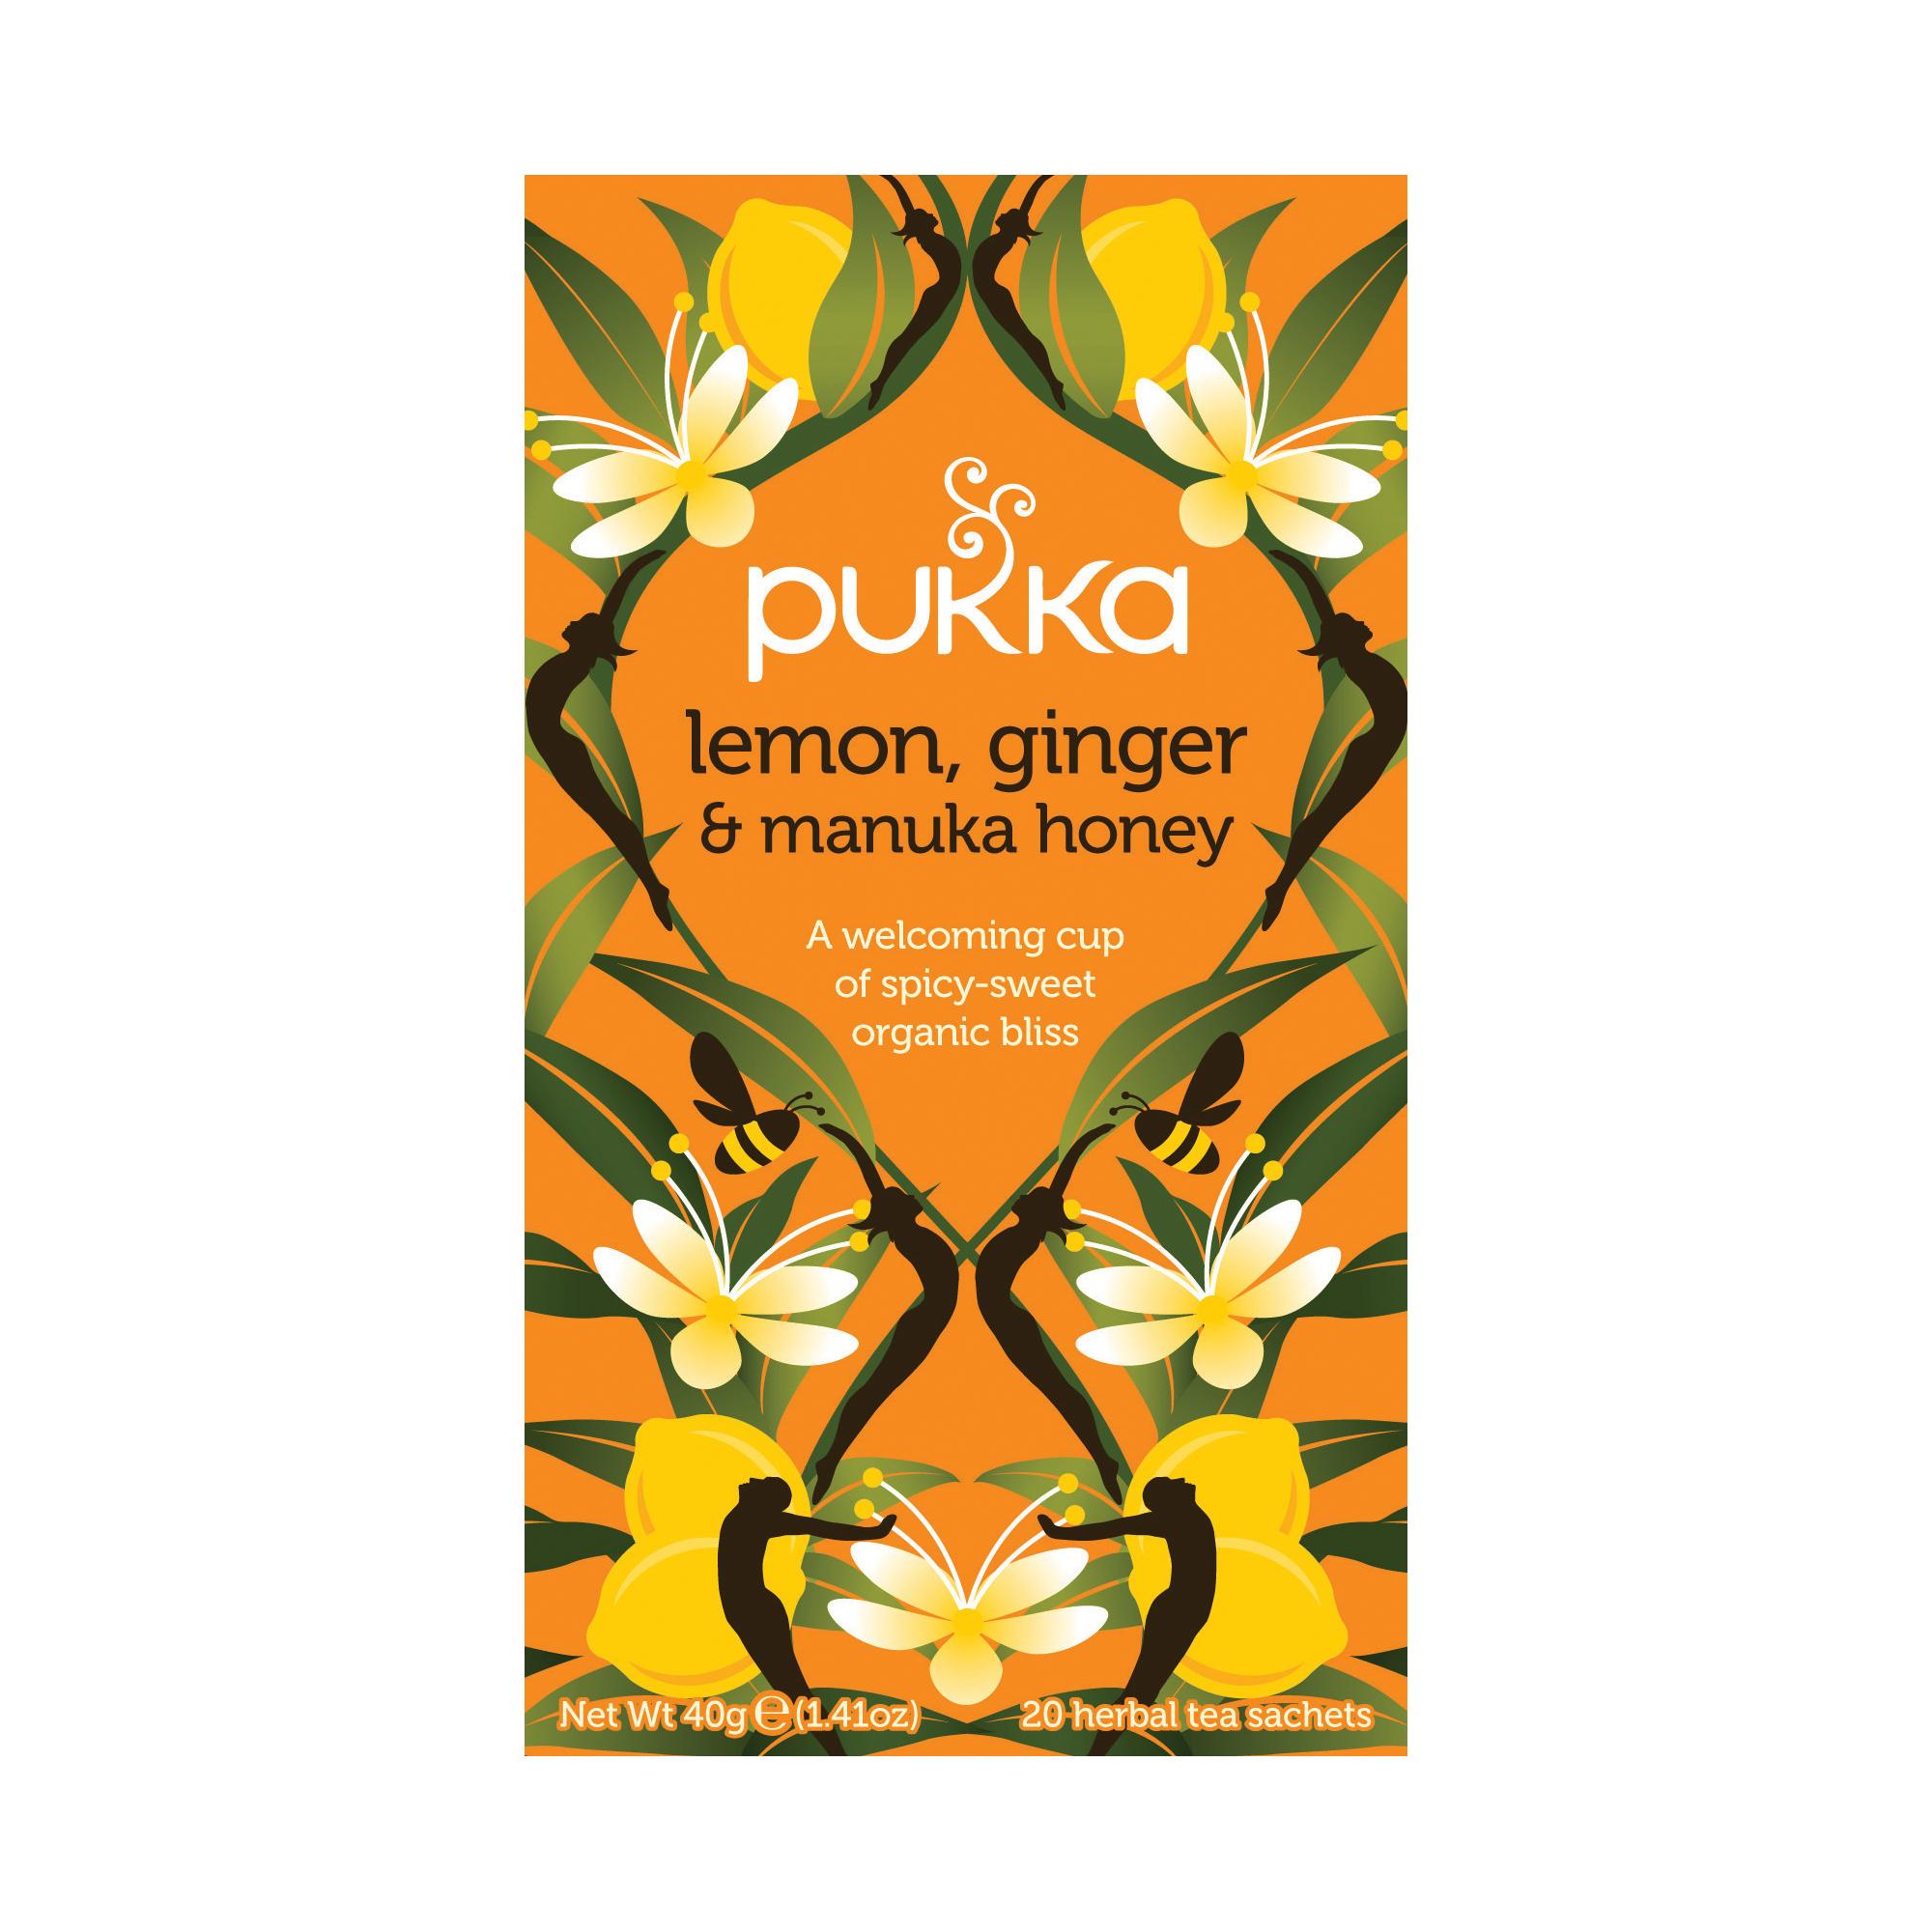 Pukka Individually Enveloped Tea Bags Lemon Ginger and Manuka Honey Ref 5060229011541 [Pack 20]